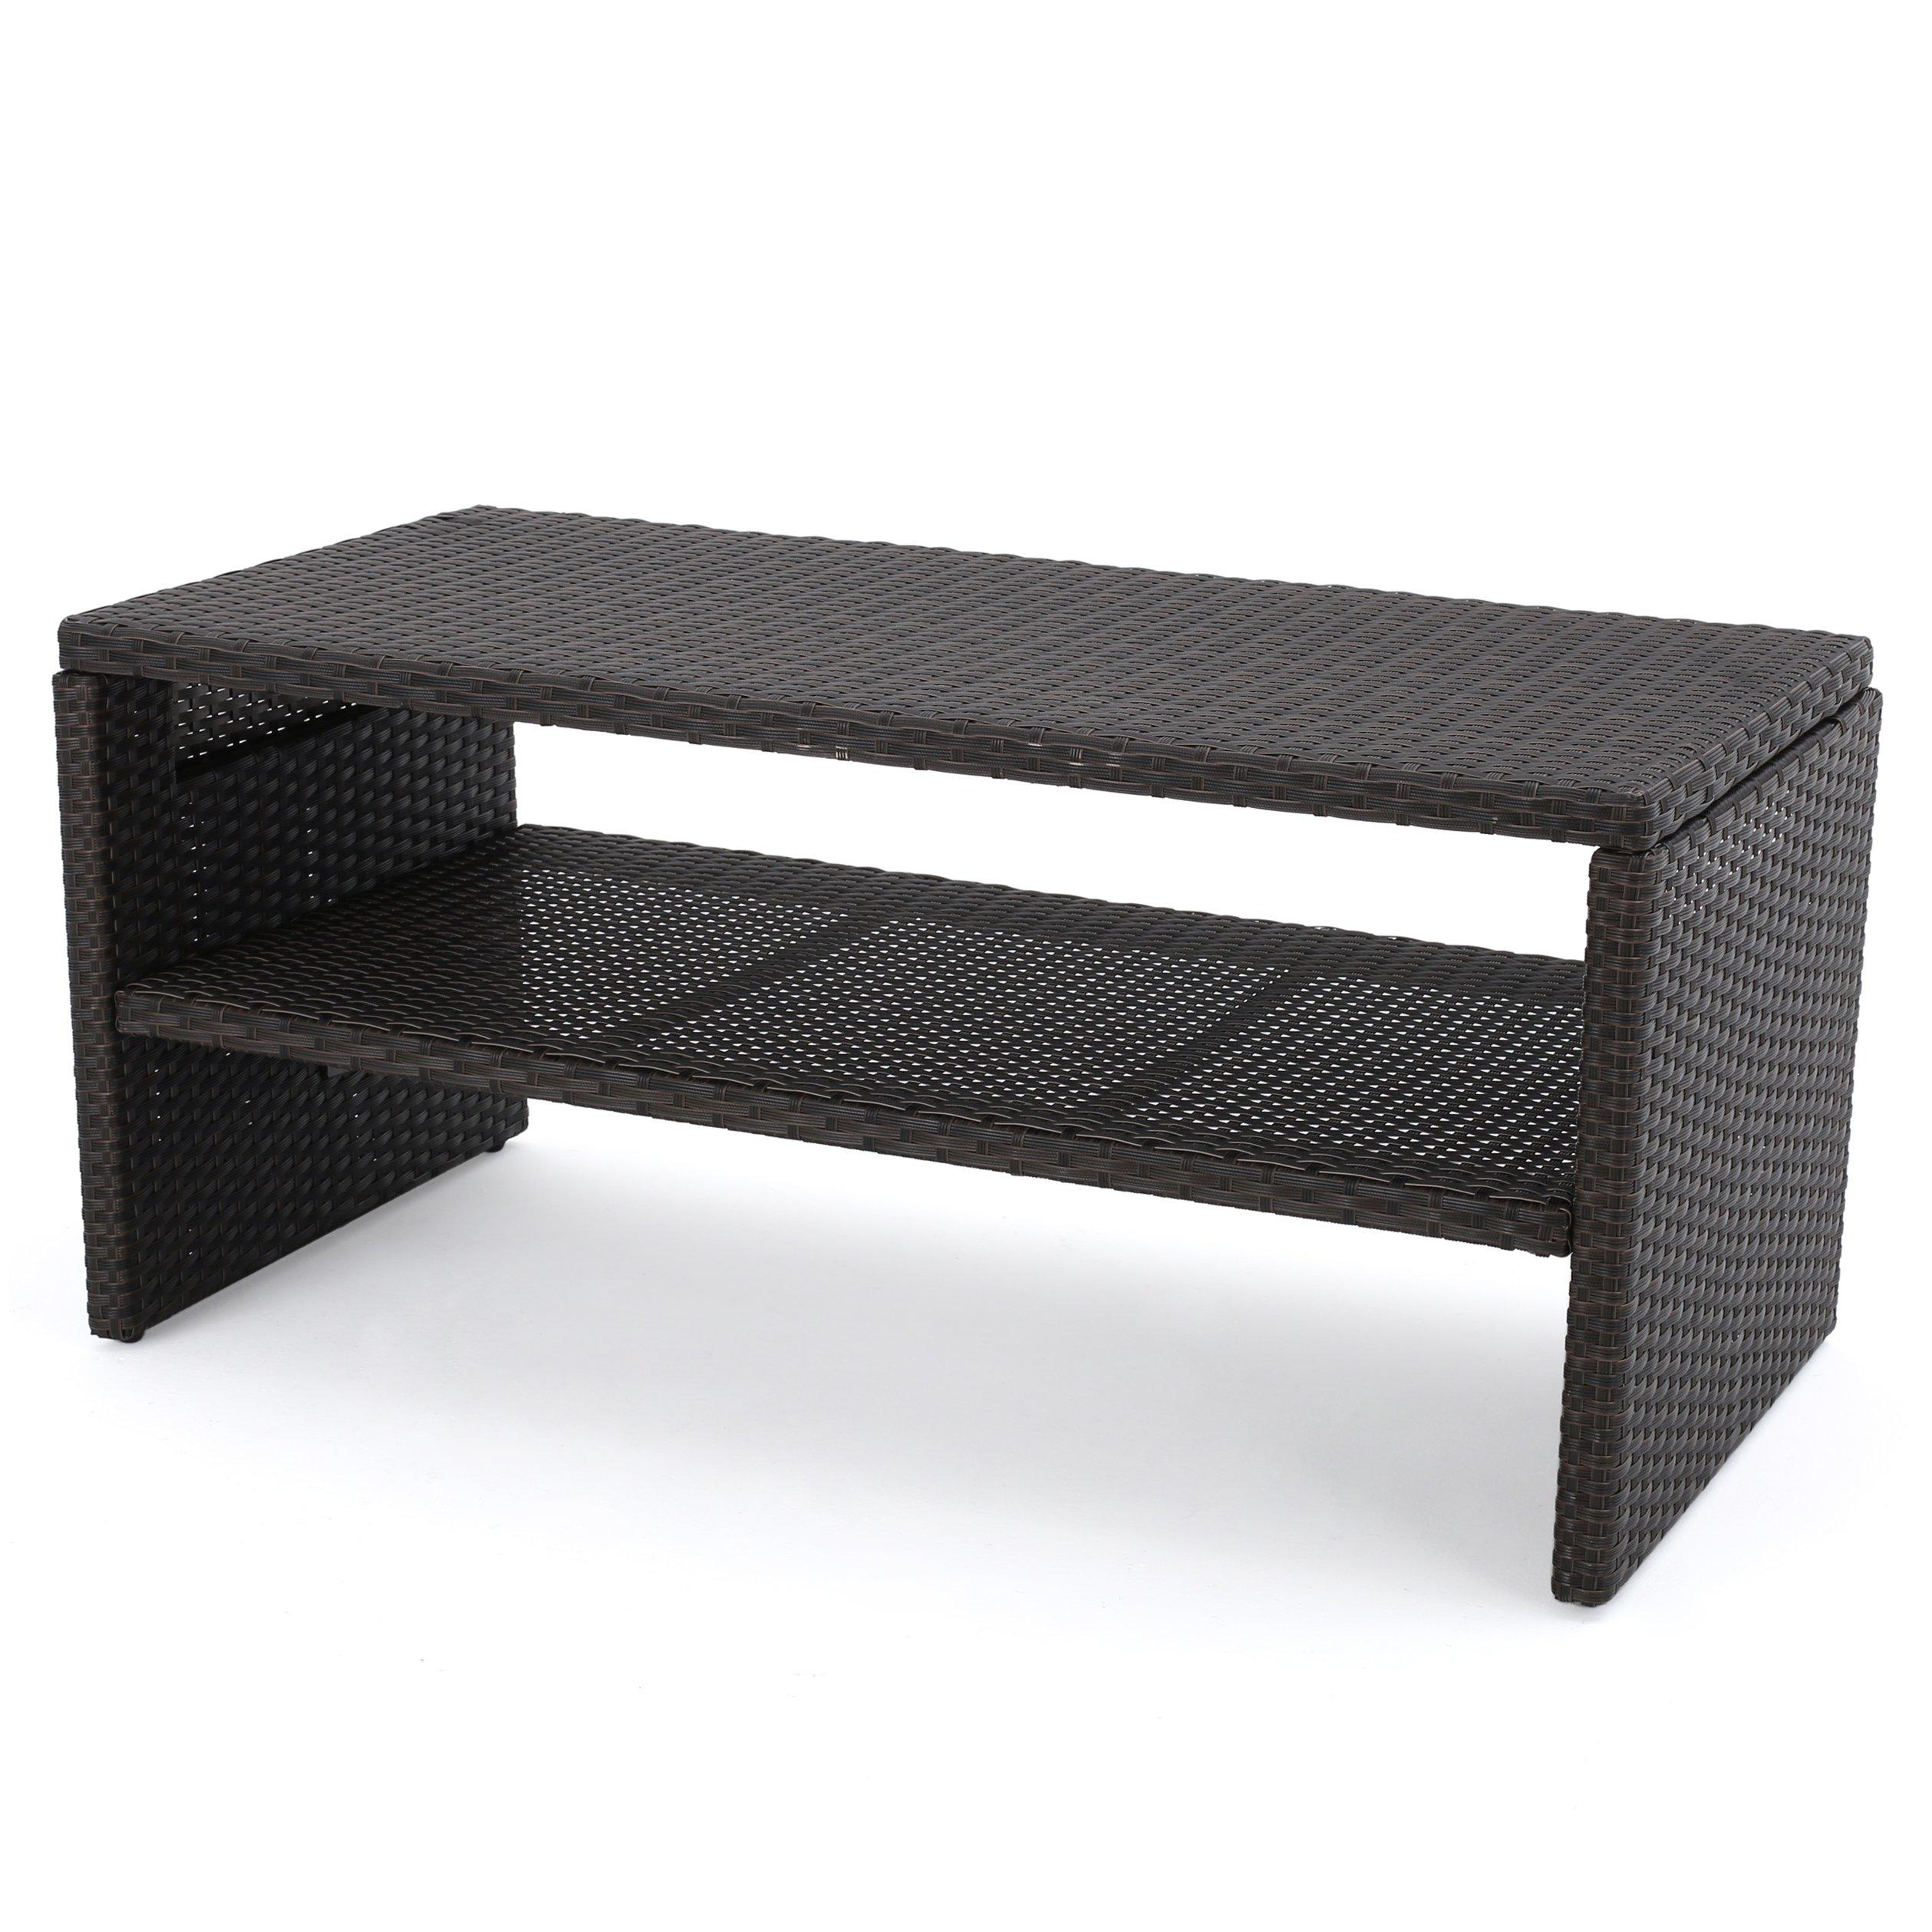 Great Deal Furniture Luzia Outdoor Wicker Coffee Table, Dark Brown Finish